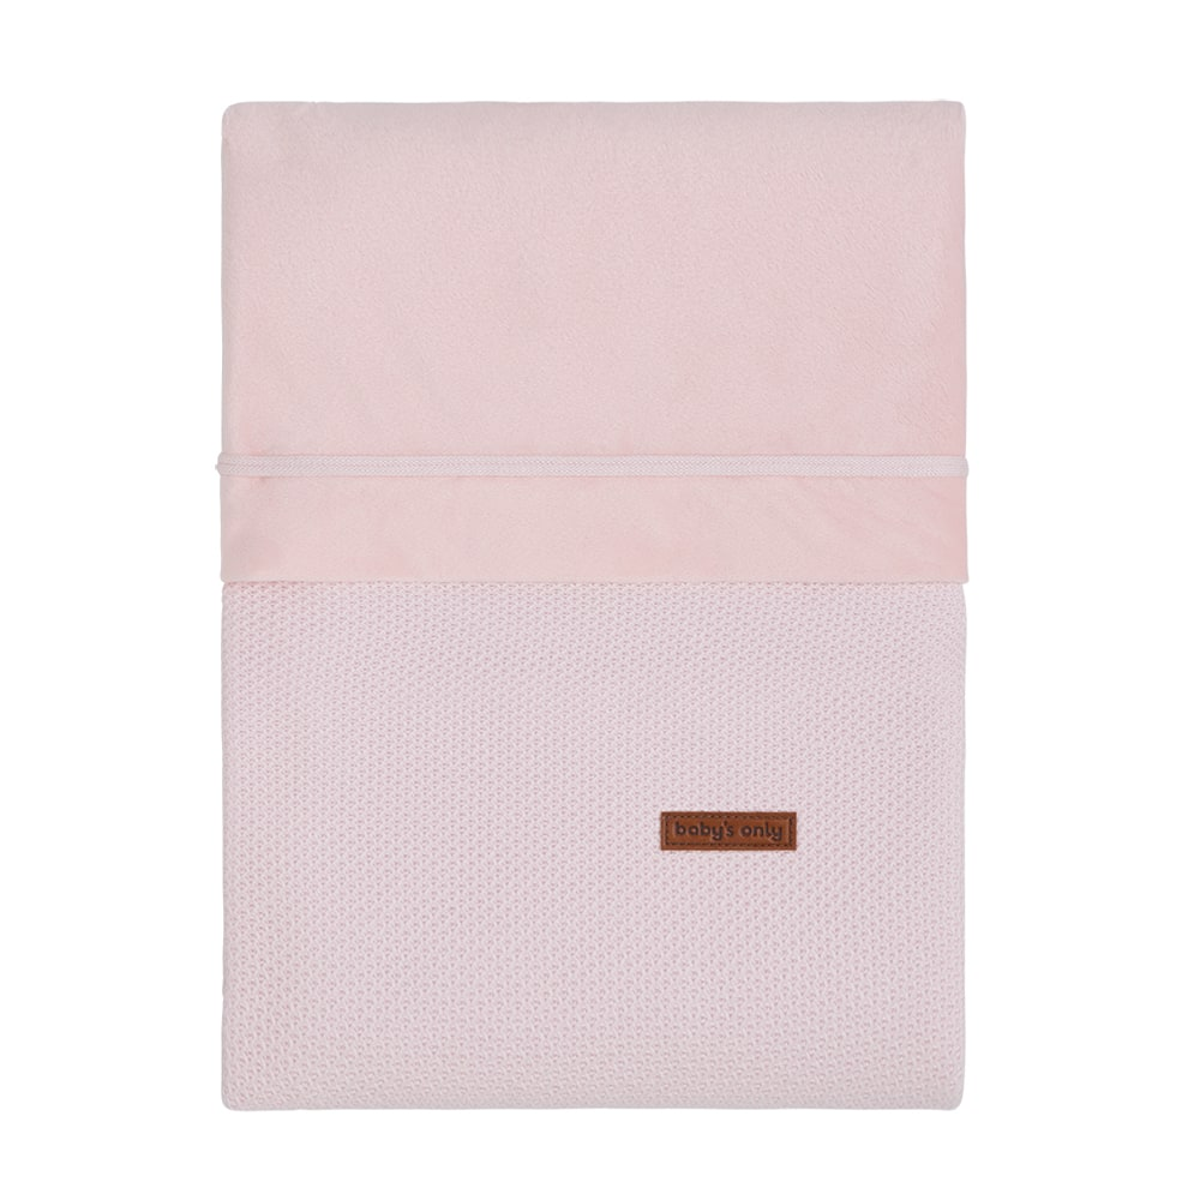 babys only 0200701 dekbedovertrek 80x80 classic roze